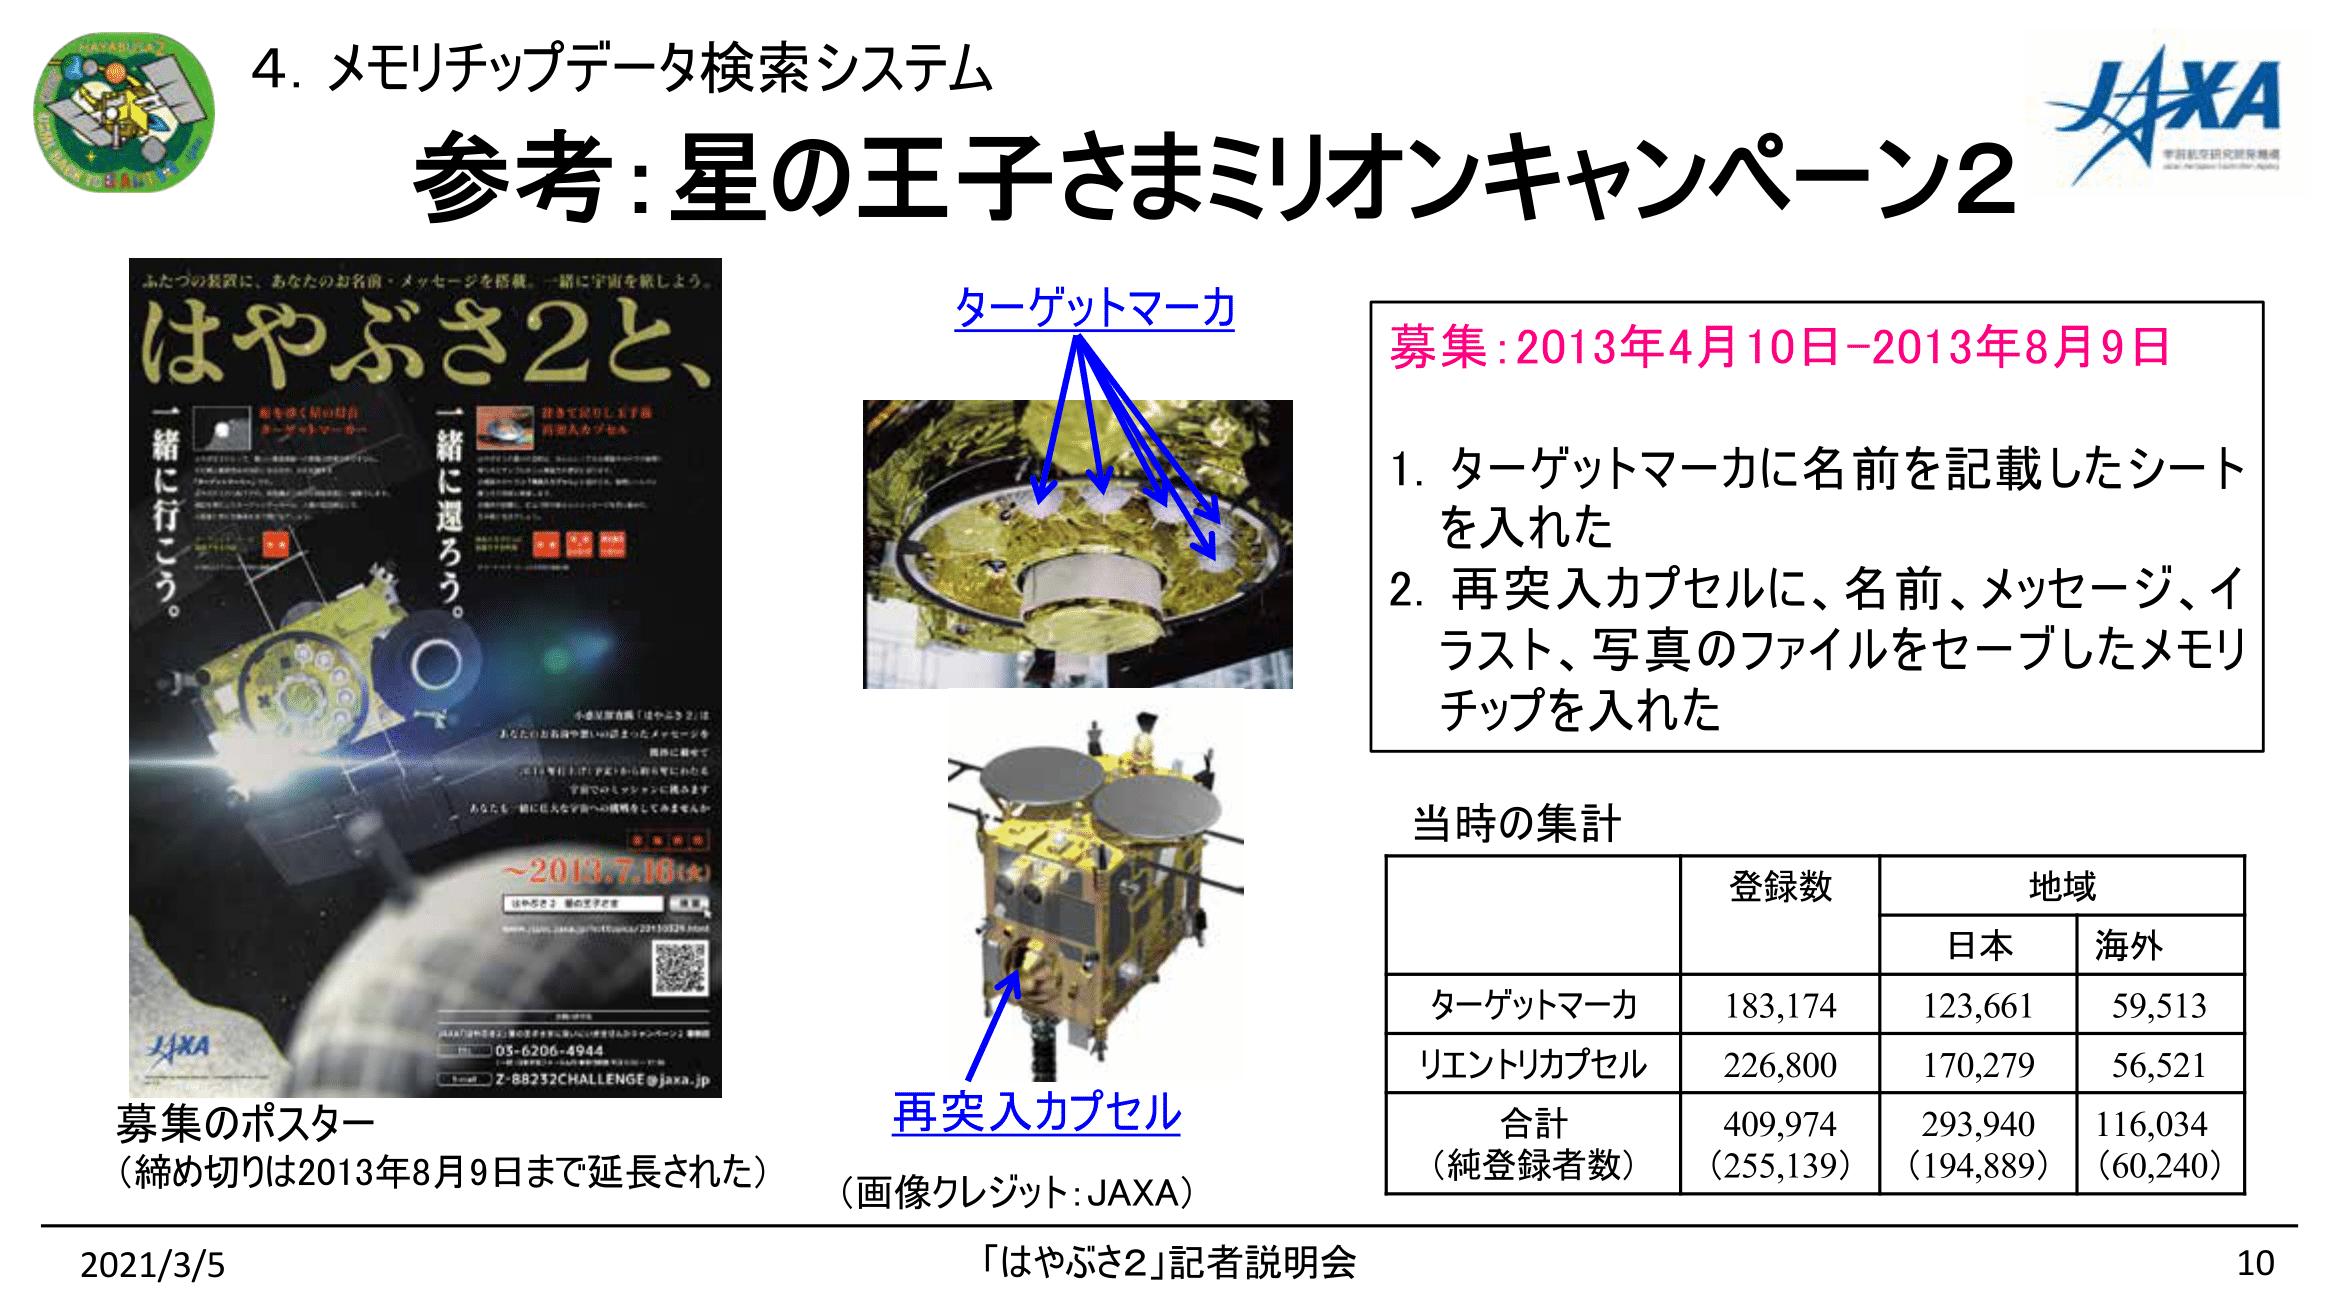 f:id:Imamura:20210305134150p:plain